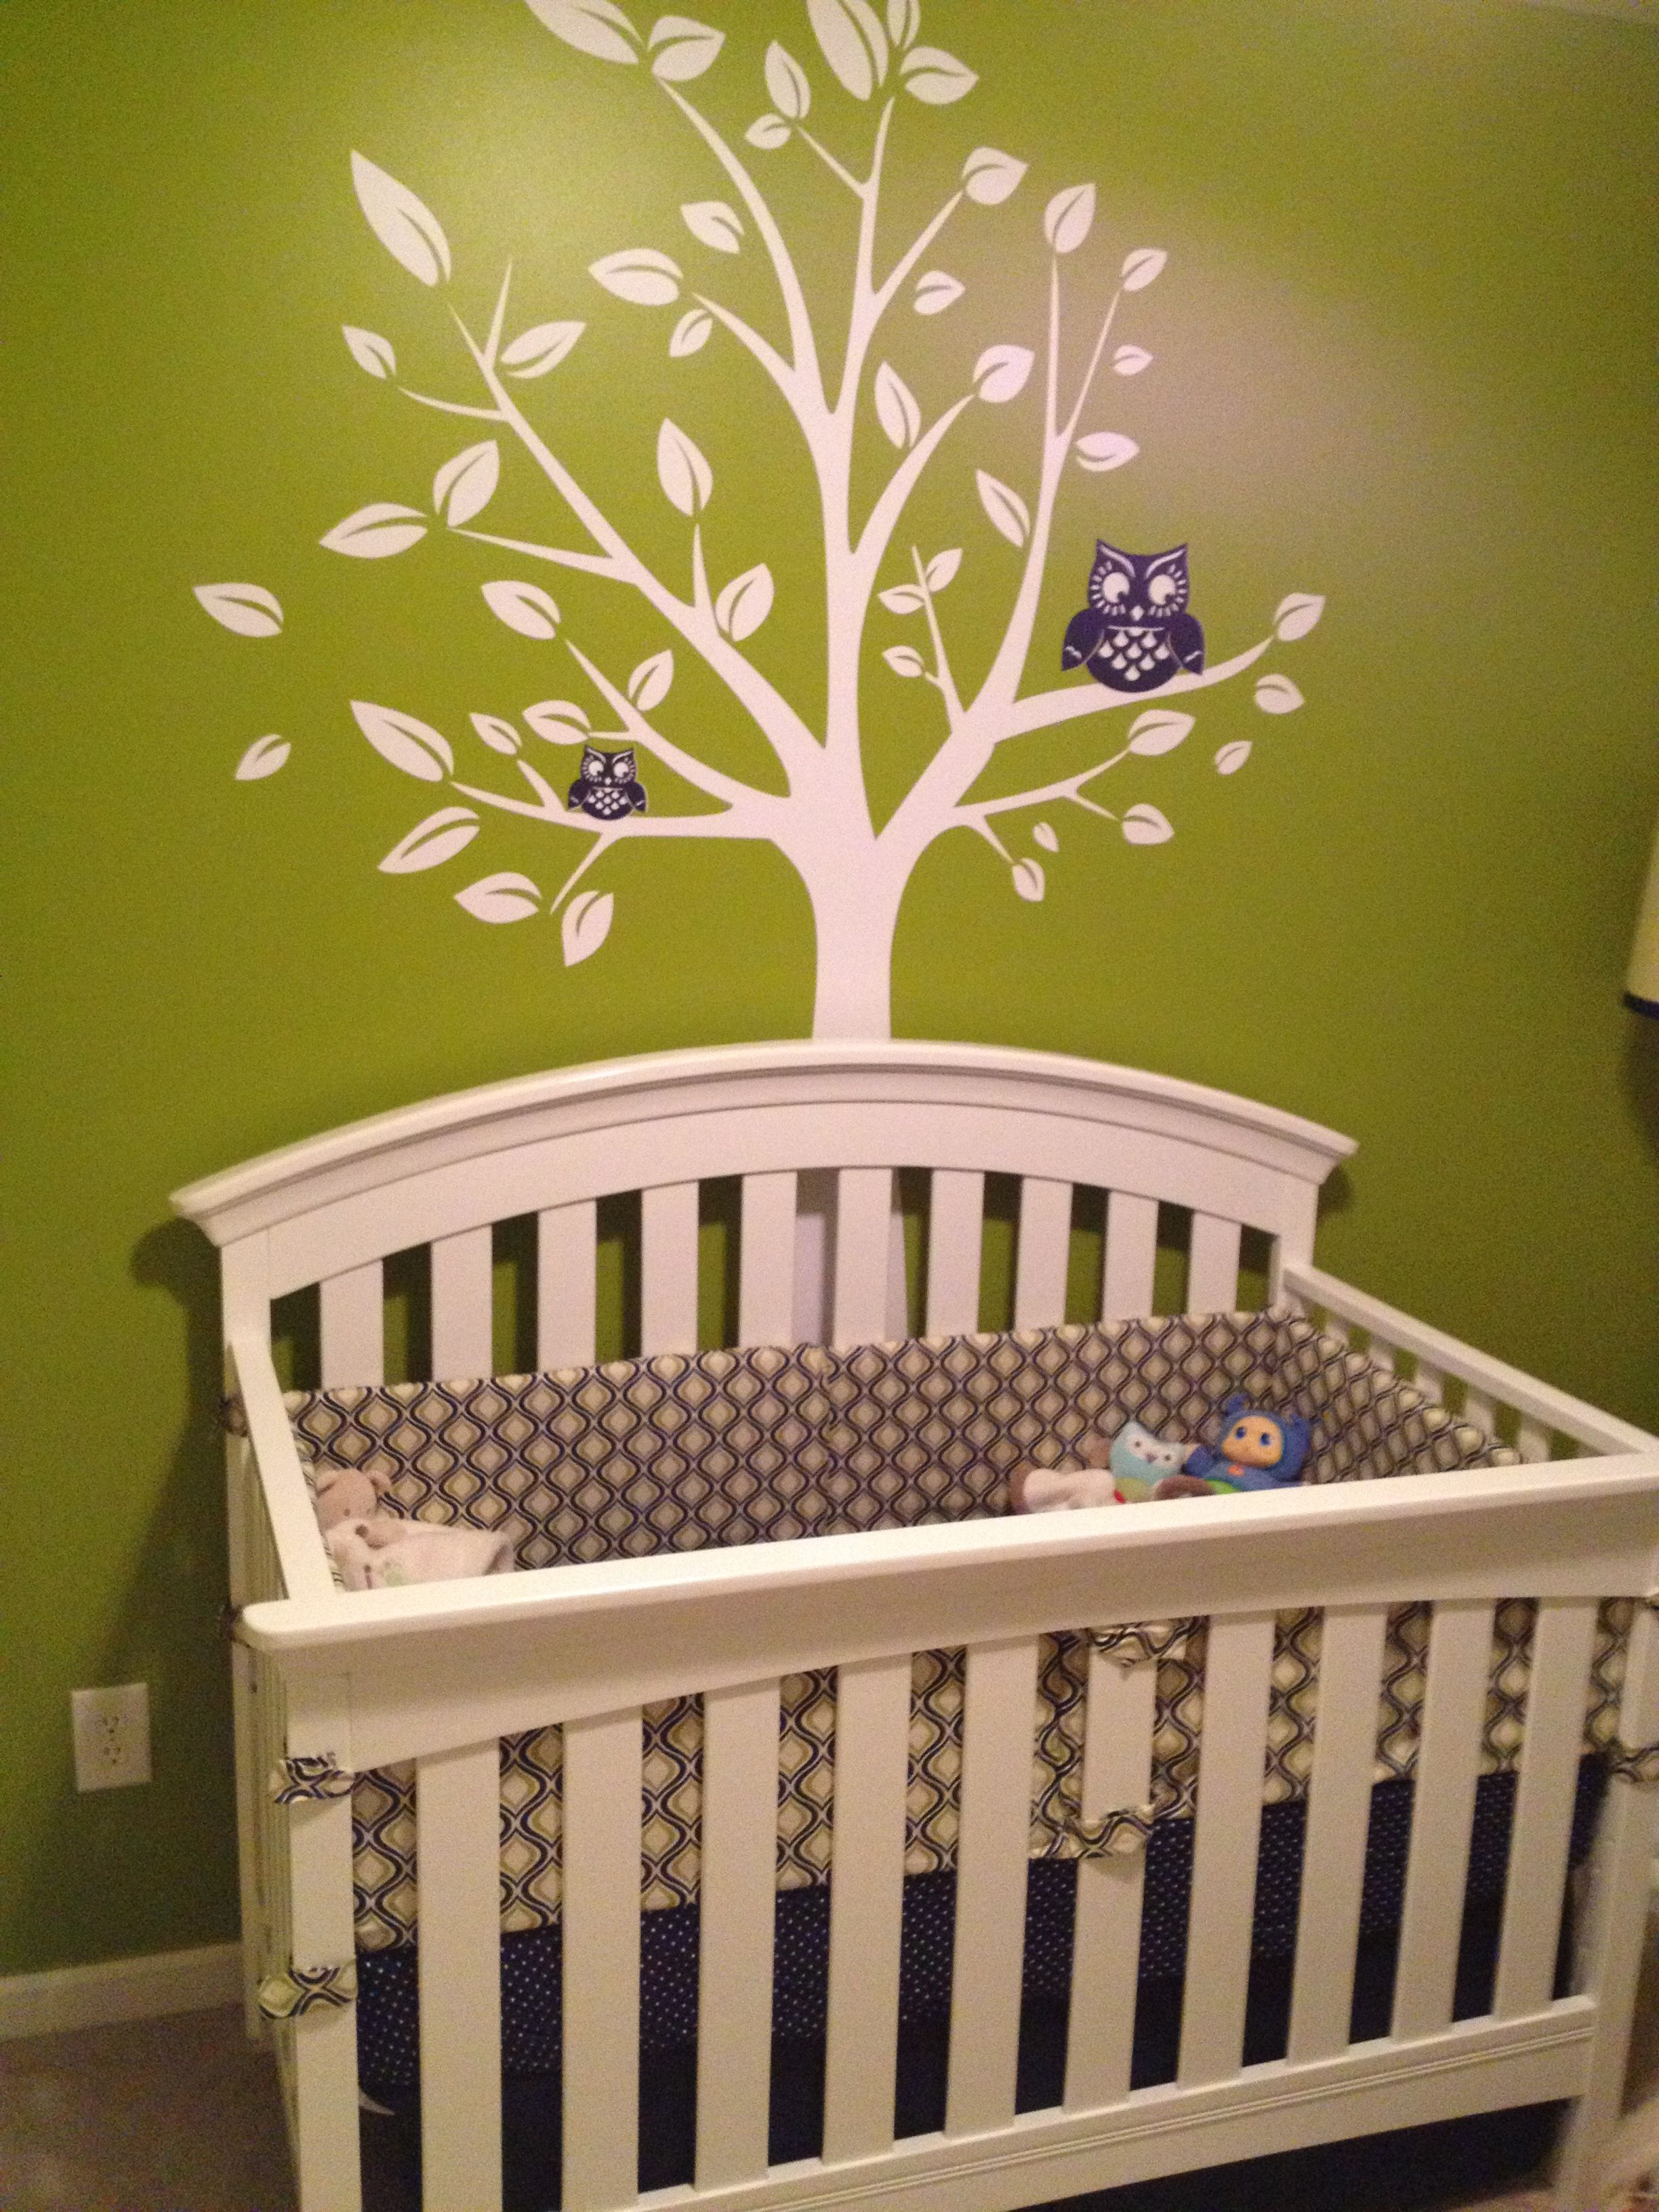 Woodlands baby boy nursery